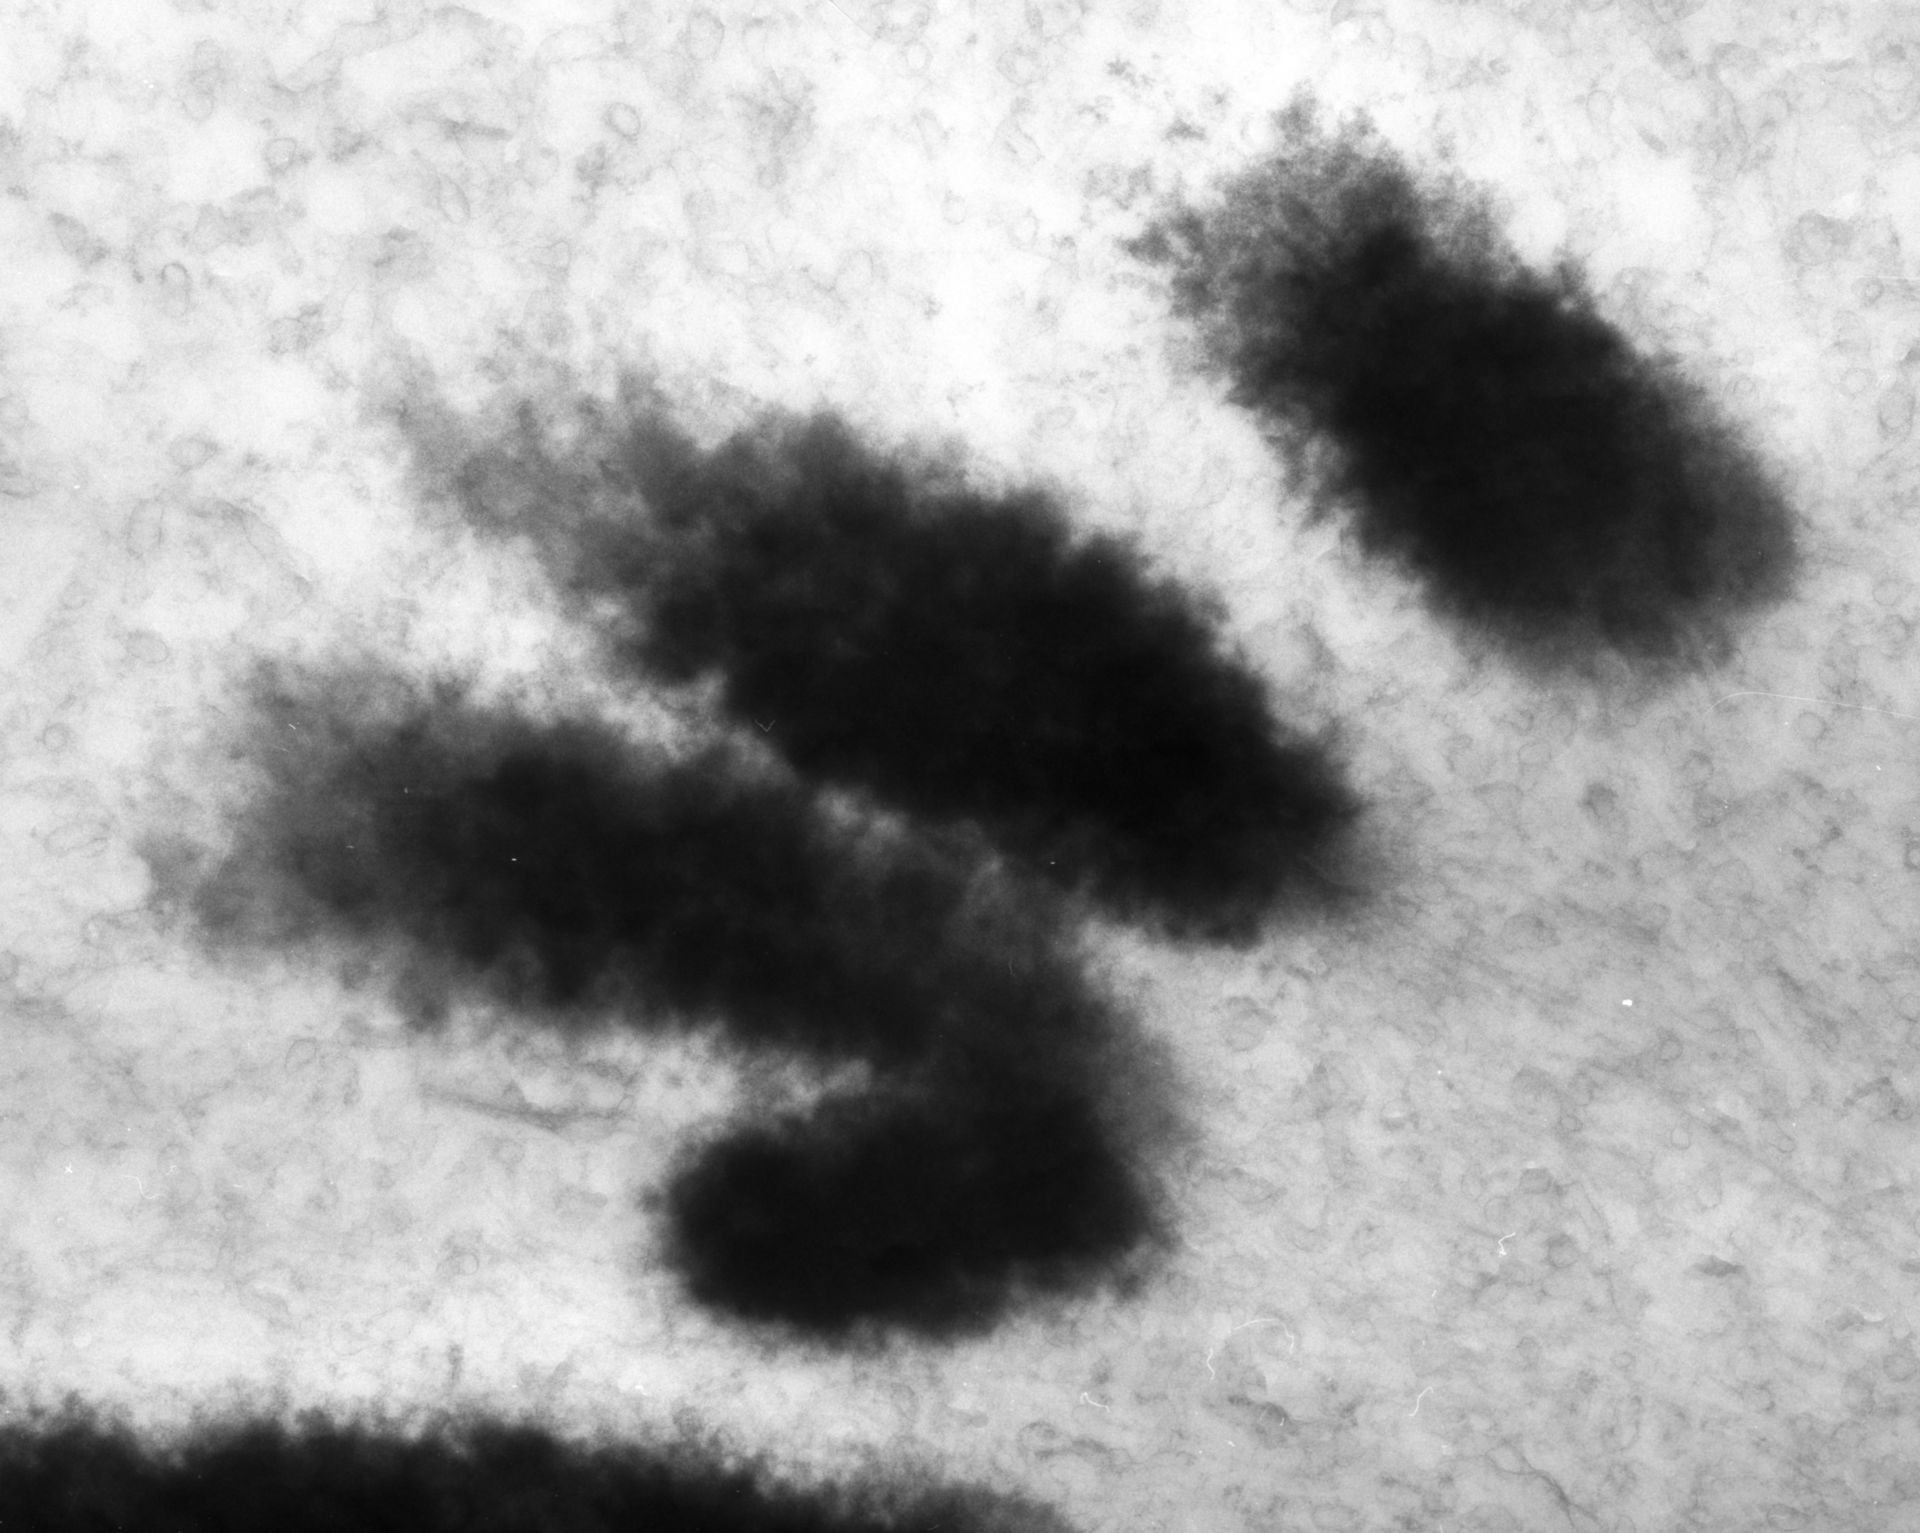 Haemanthus katharinae (Nuclear chromosome) - CIL:11909